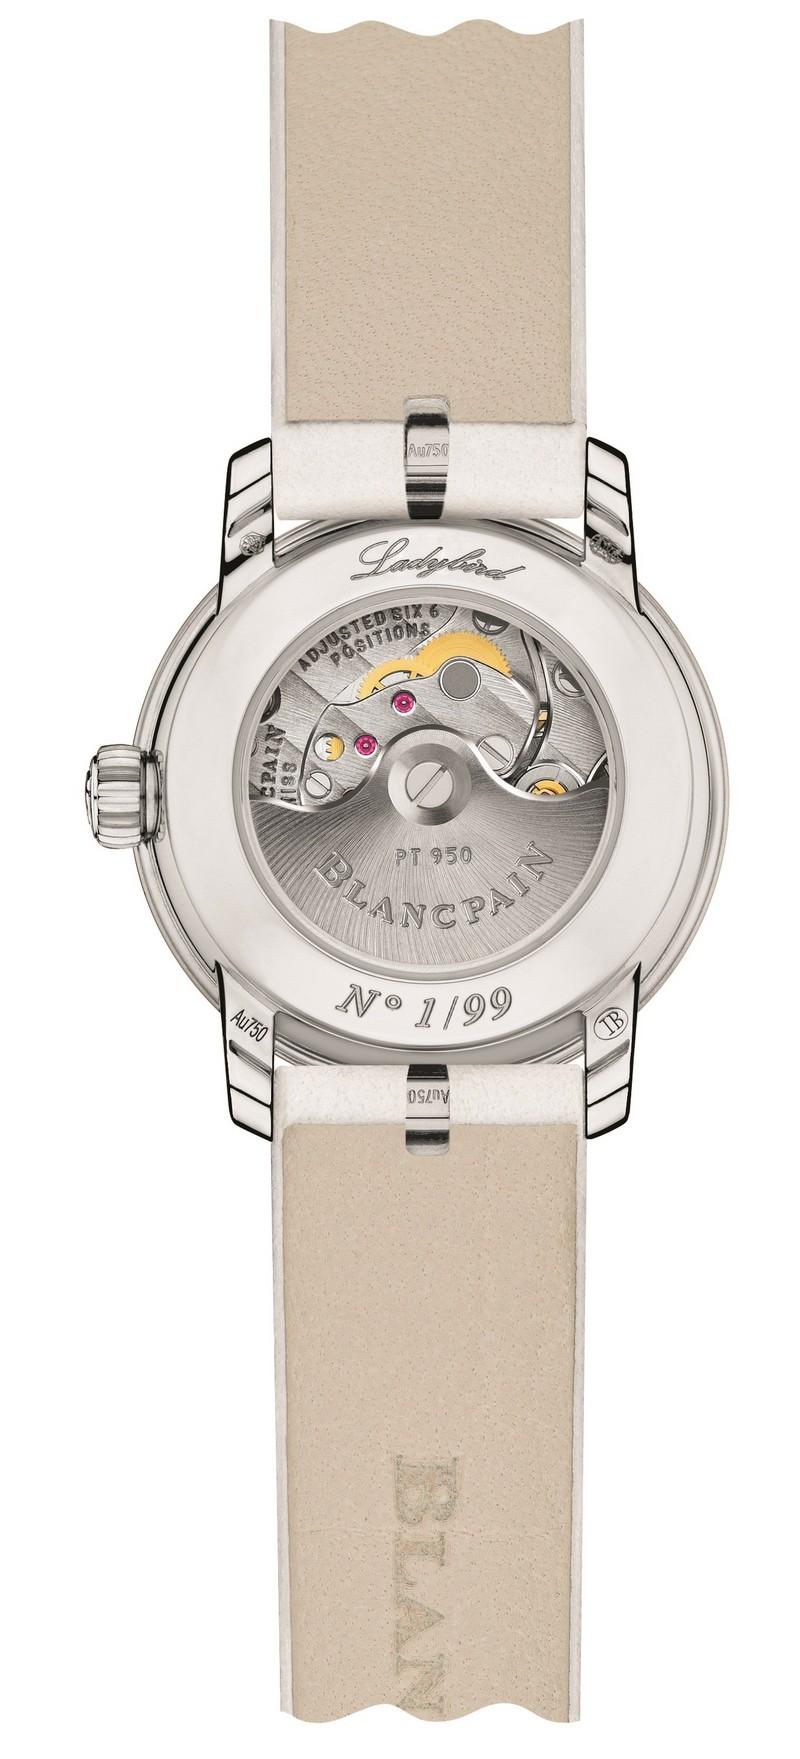 Luxusni damske hodinky Blancpain Ladybird